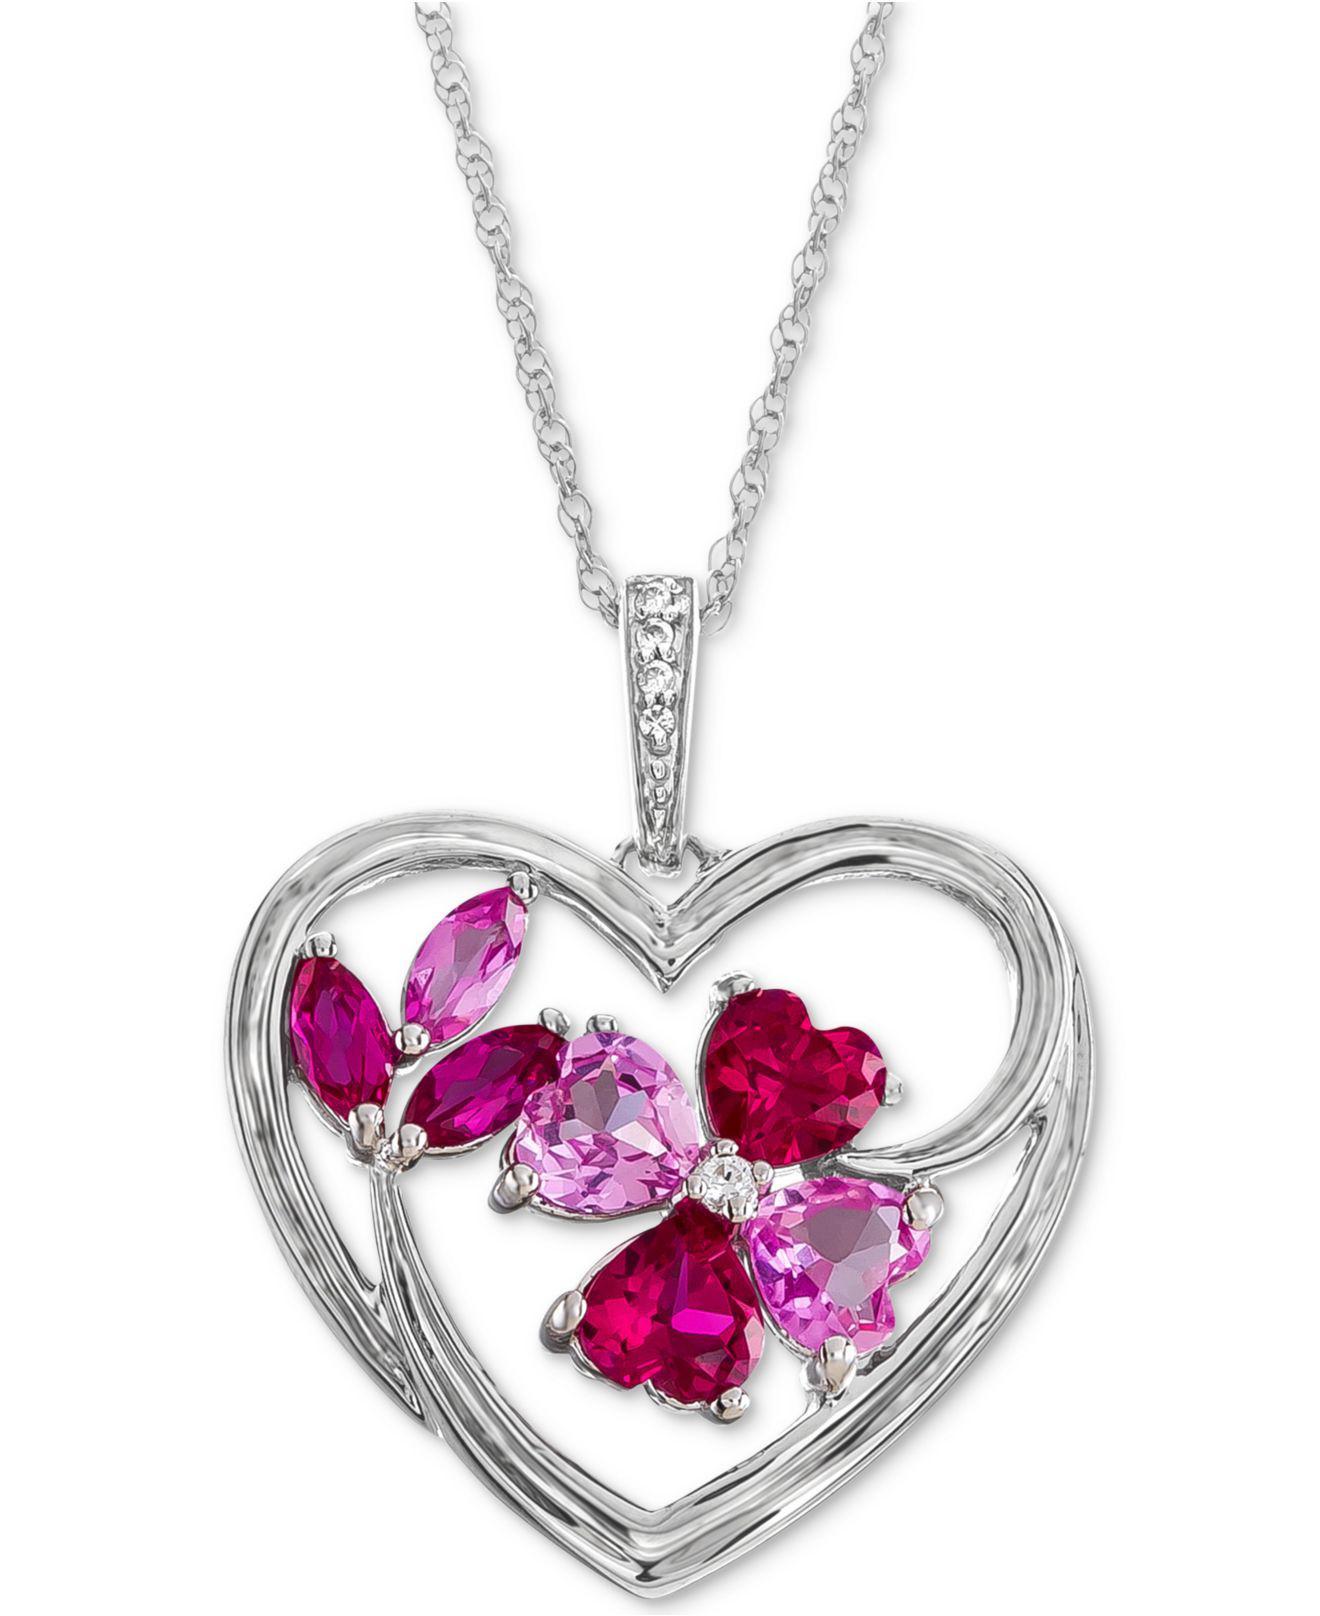 Macys lab created multi gemstone heart pendant necklace 1 13 ct macys womens metallic lab created multi gemstone heart pendant mozeypictures Image collections